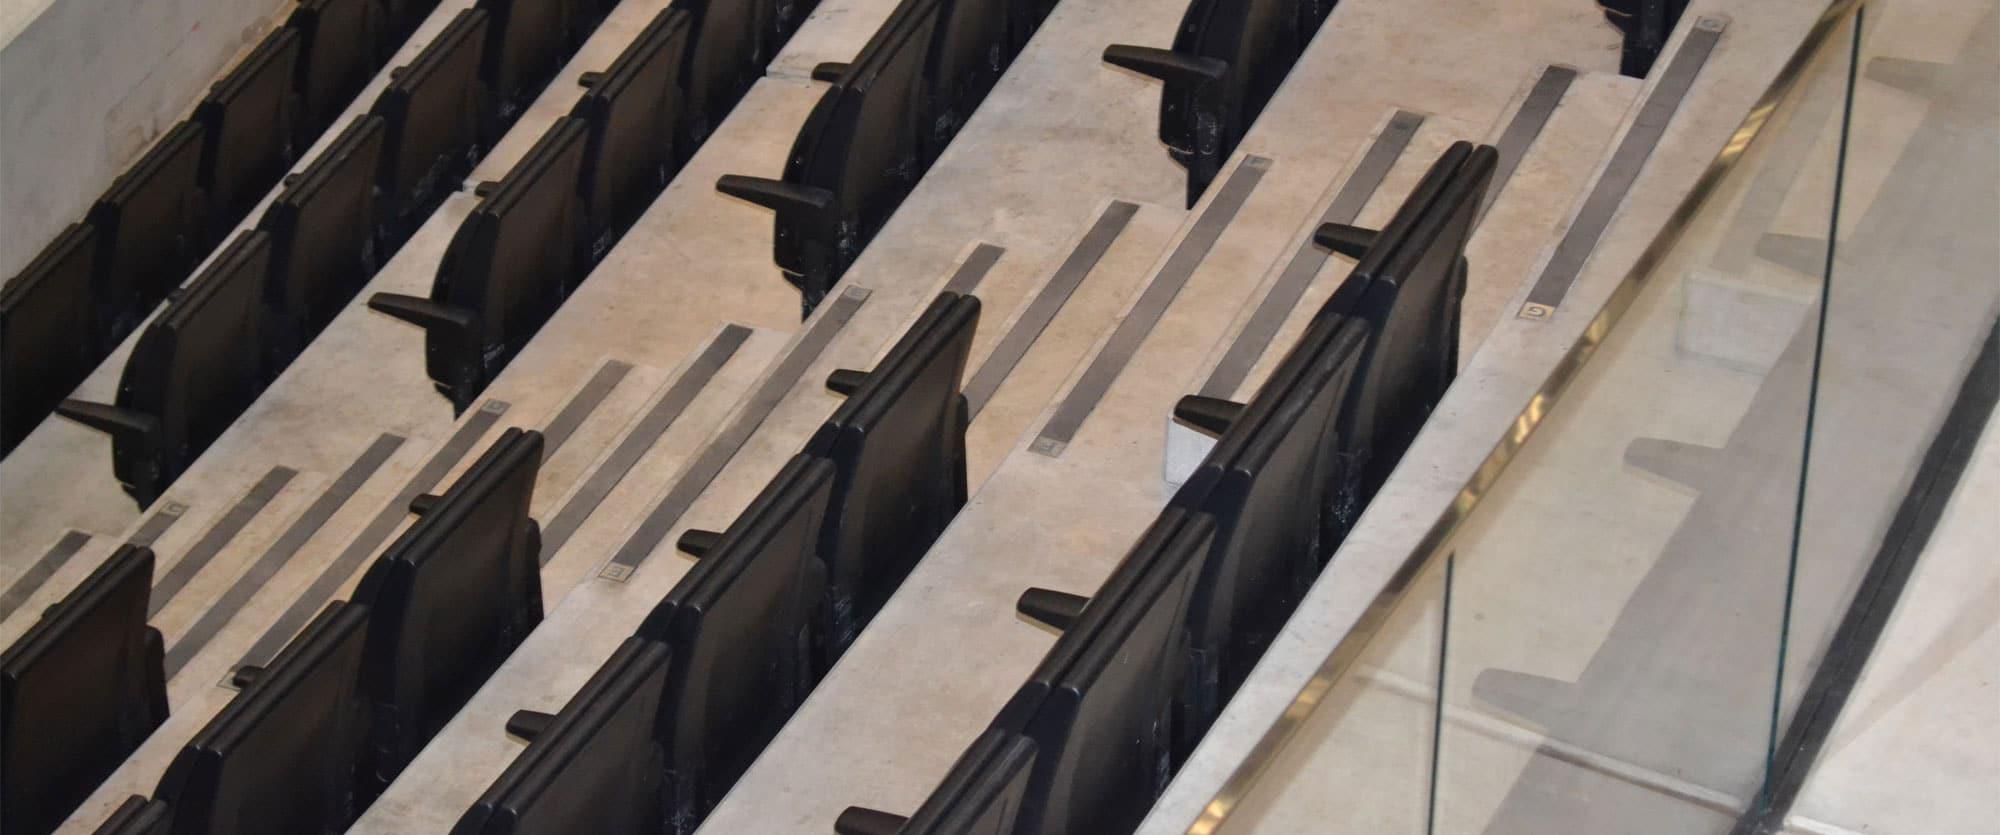 Stepline Carborundum anti slip step inserts used at arena in Glasgow